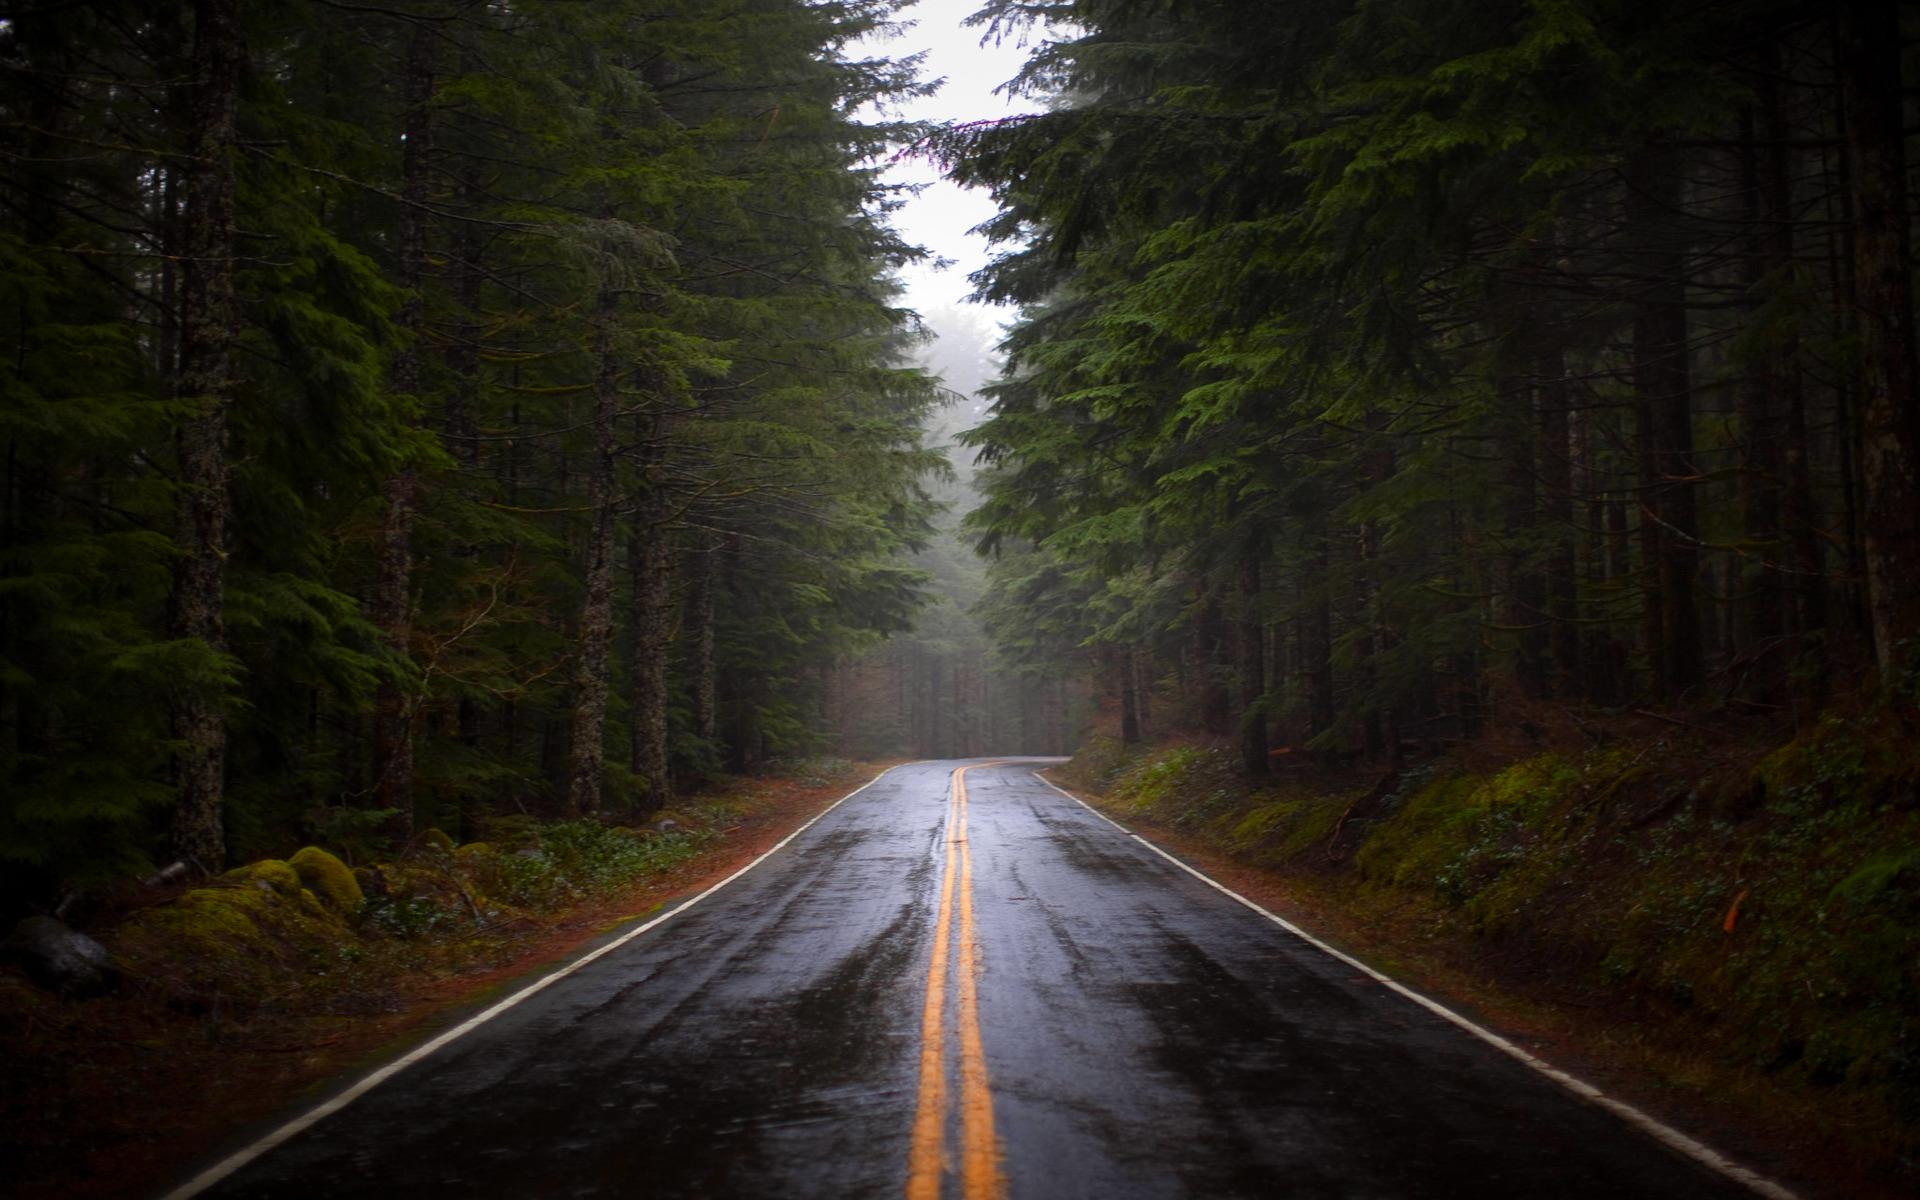 Cars 2 Wallpaper Free Download Hd Foggy Forest Backgrounds Free Download Pixelstalk Net